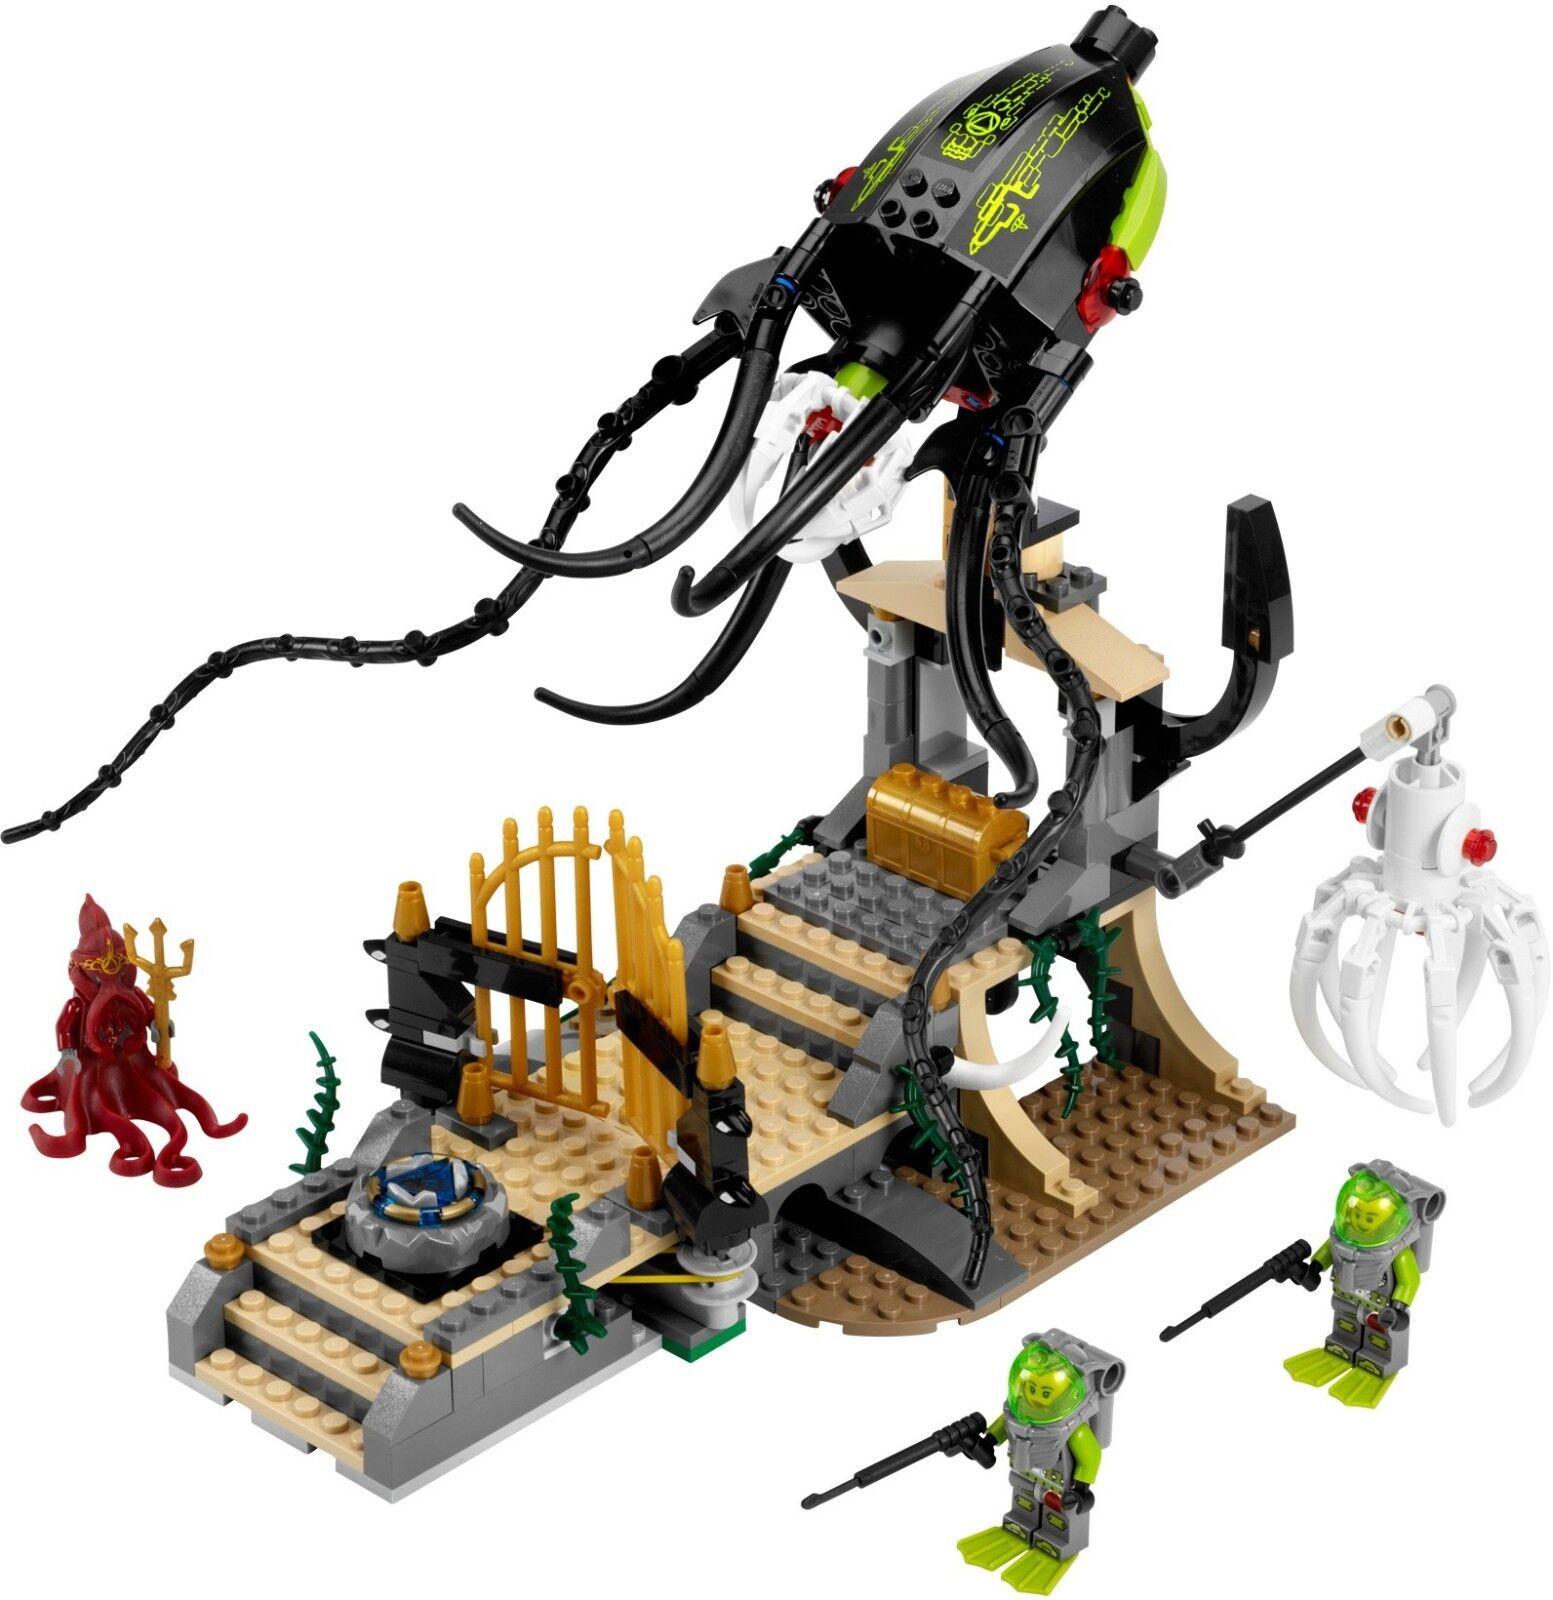 Lego Atlantis Atlantis Atlantis Set Gateway of the Squid 8061 65cca4